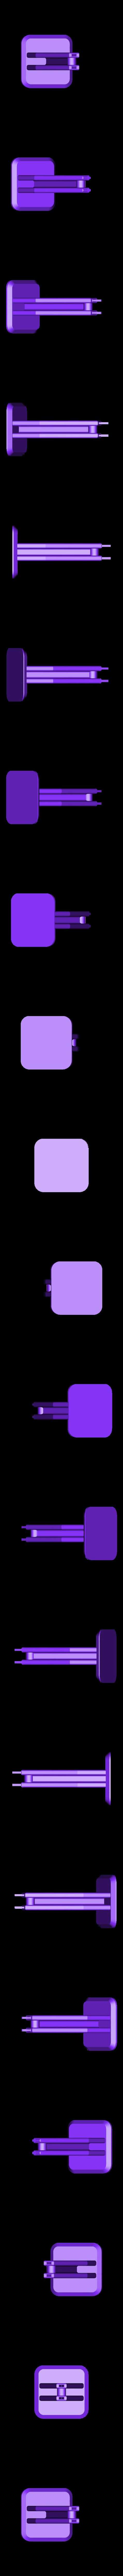 BASE.stl Download free STL file Balance • 3D printable object, Migfue